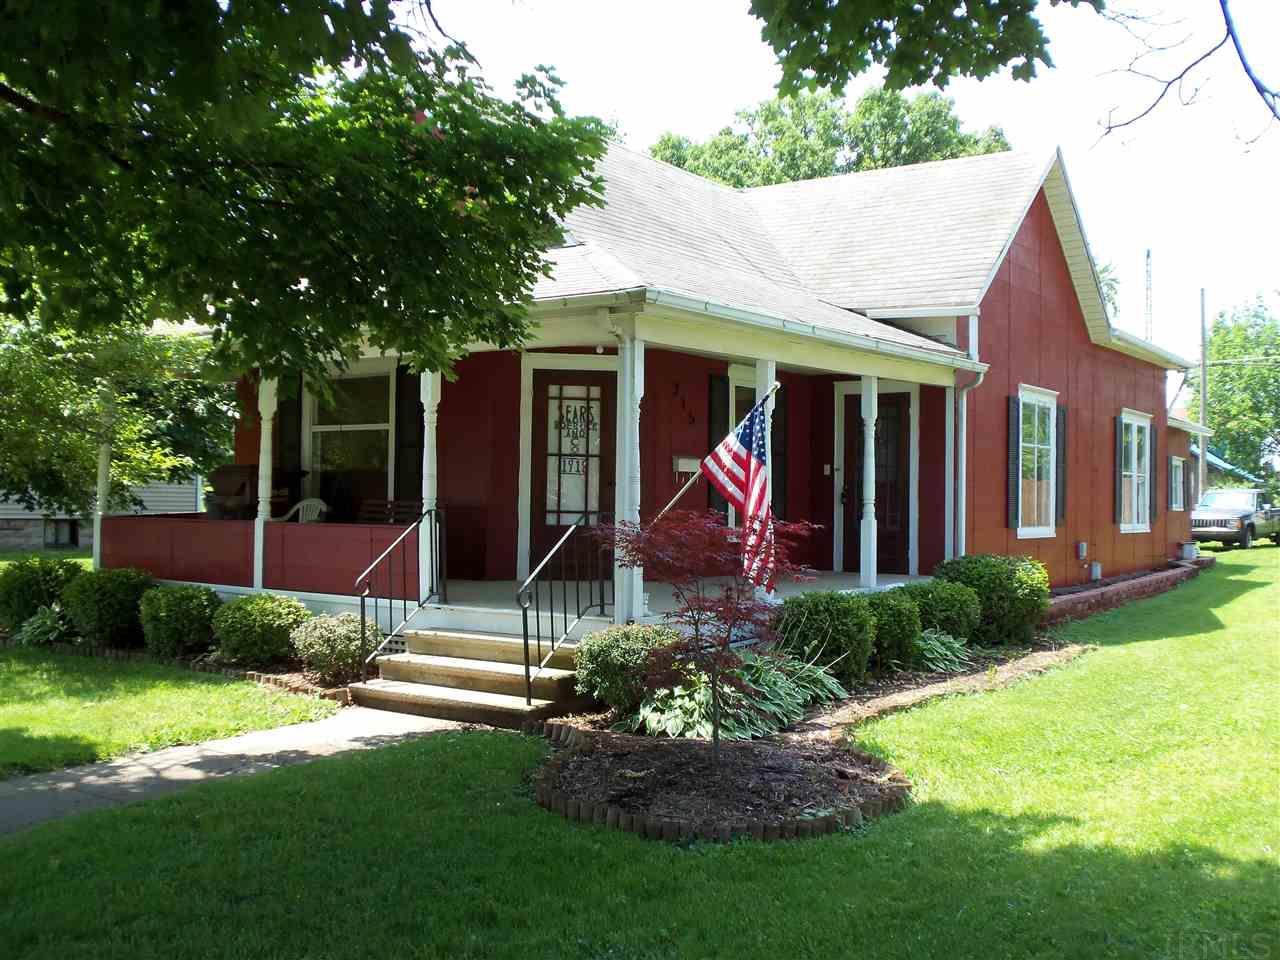 315 S Indiana, Auburn, IN 46706